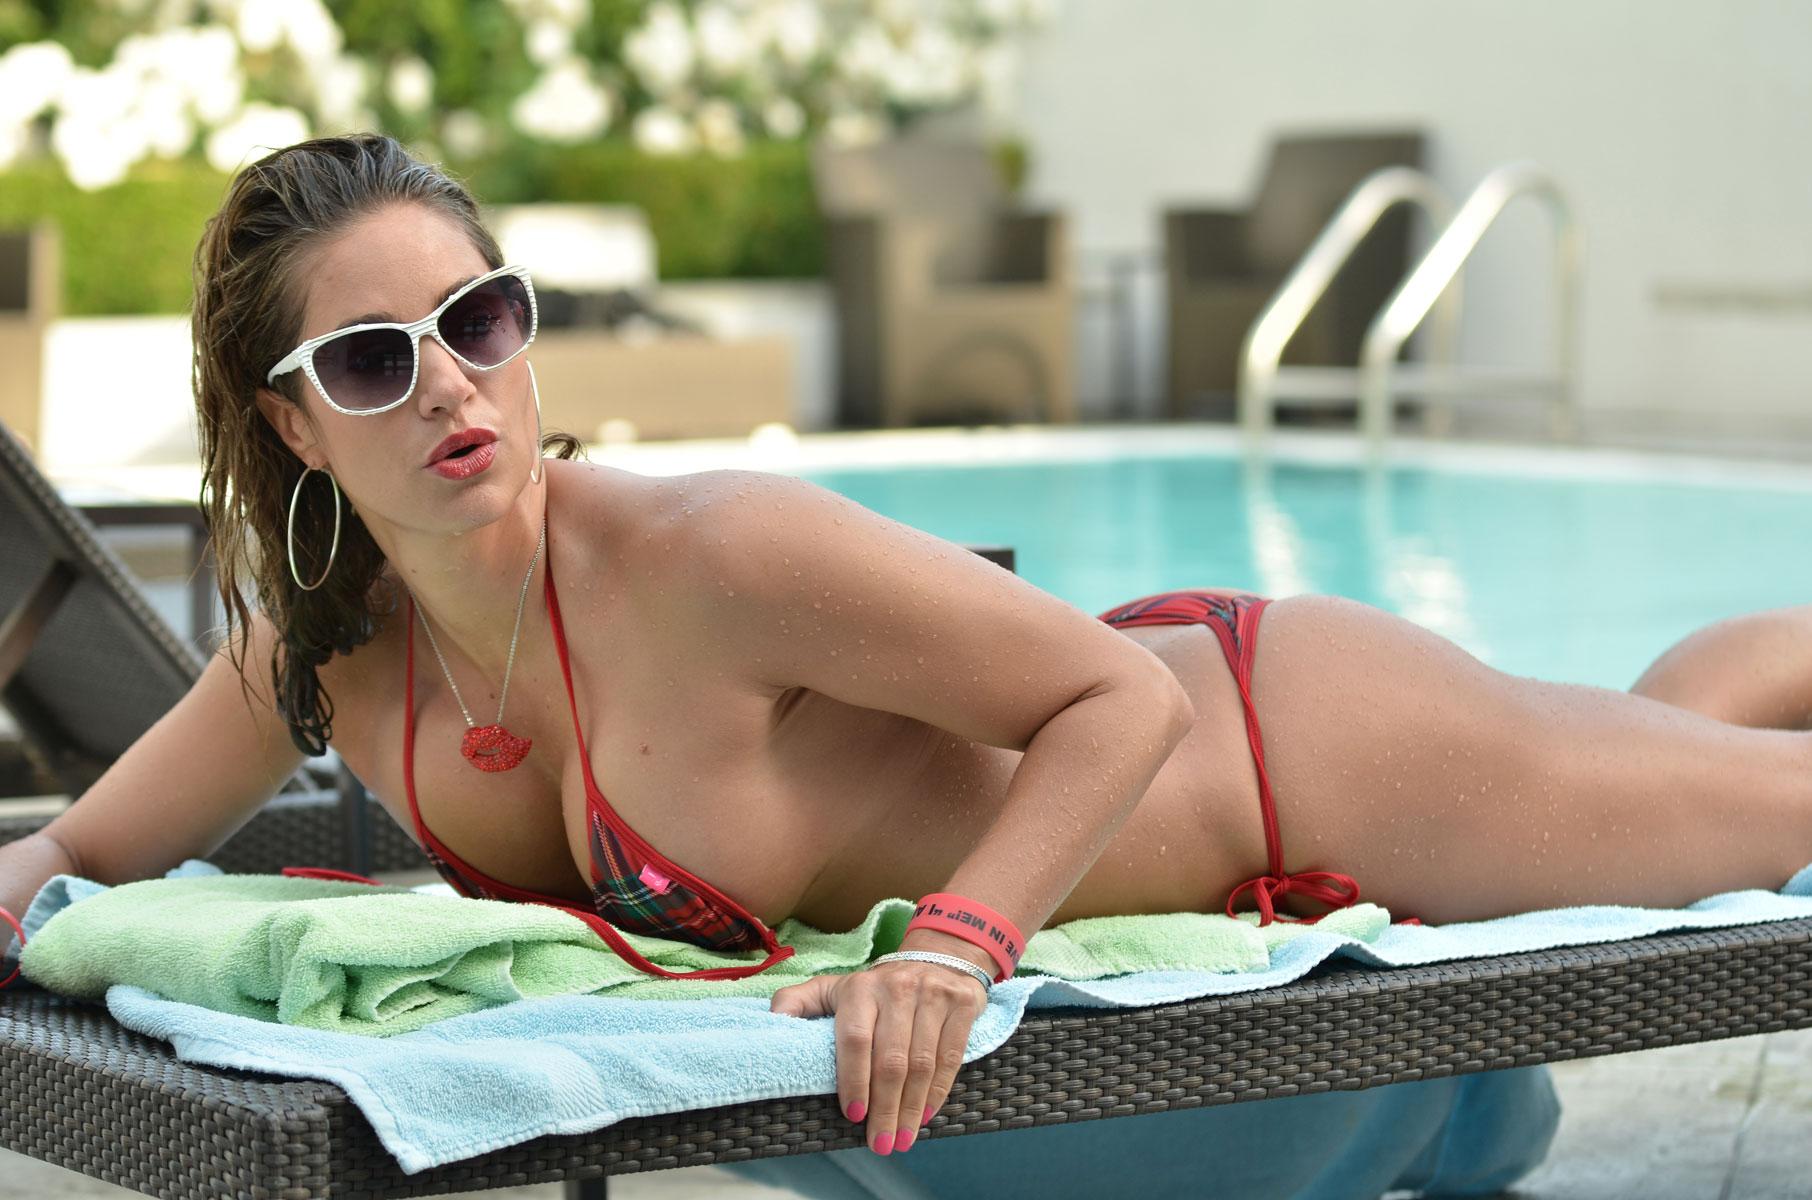 Bikini pics egotastic — 1